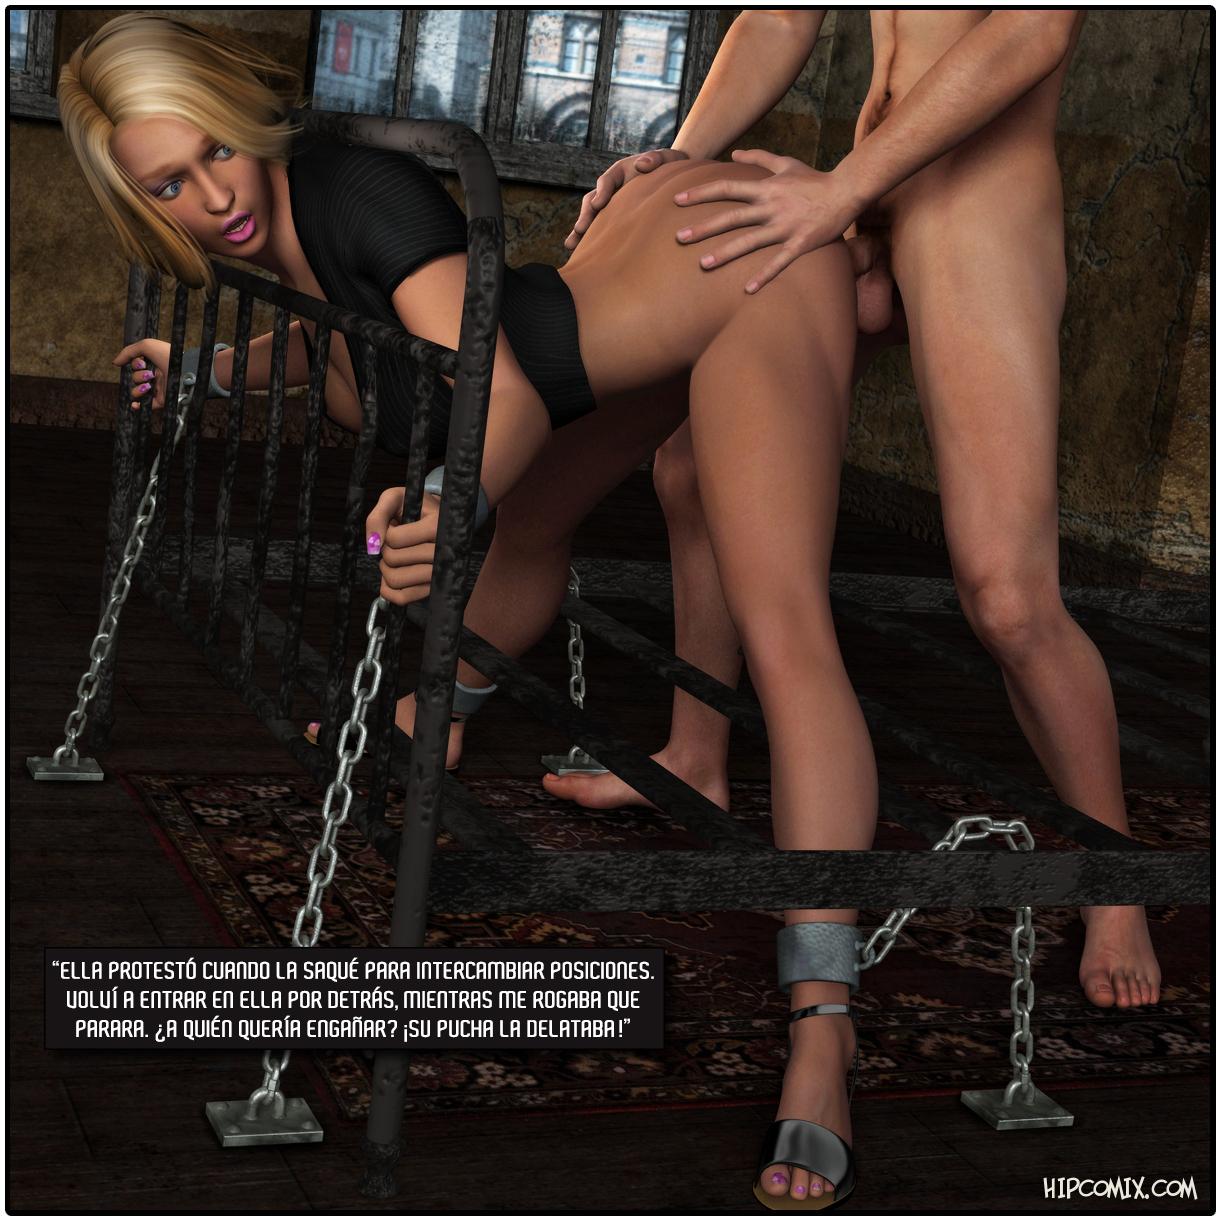 Comix: rubia secuestrada y penetrada